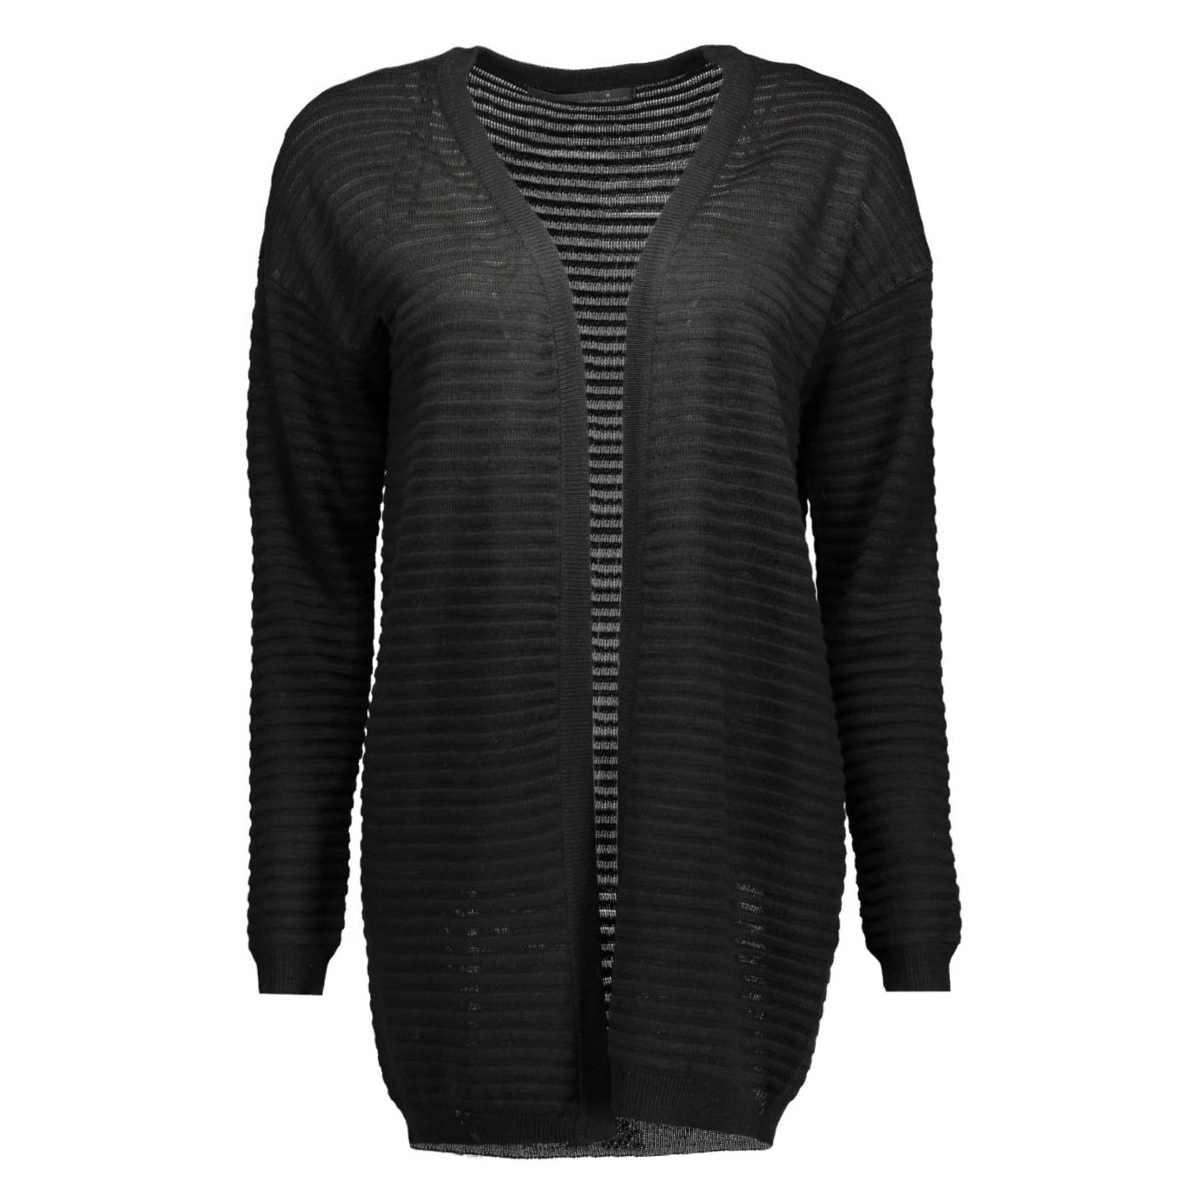 onlolivia new l/s cardigan knt noos 15115121 only vest black